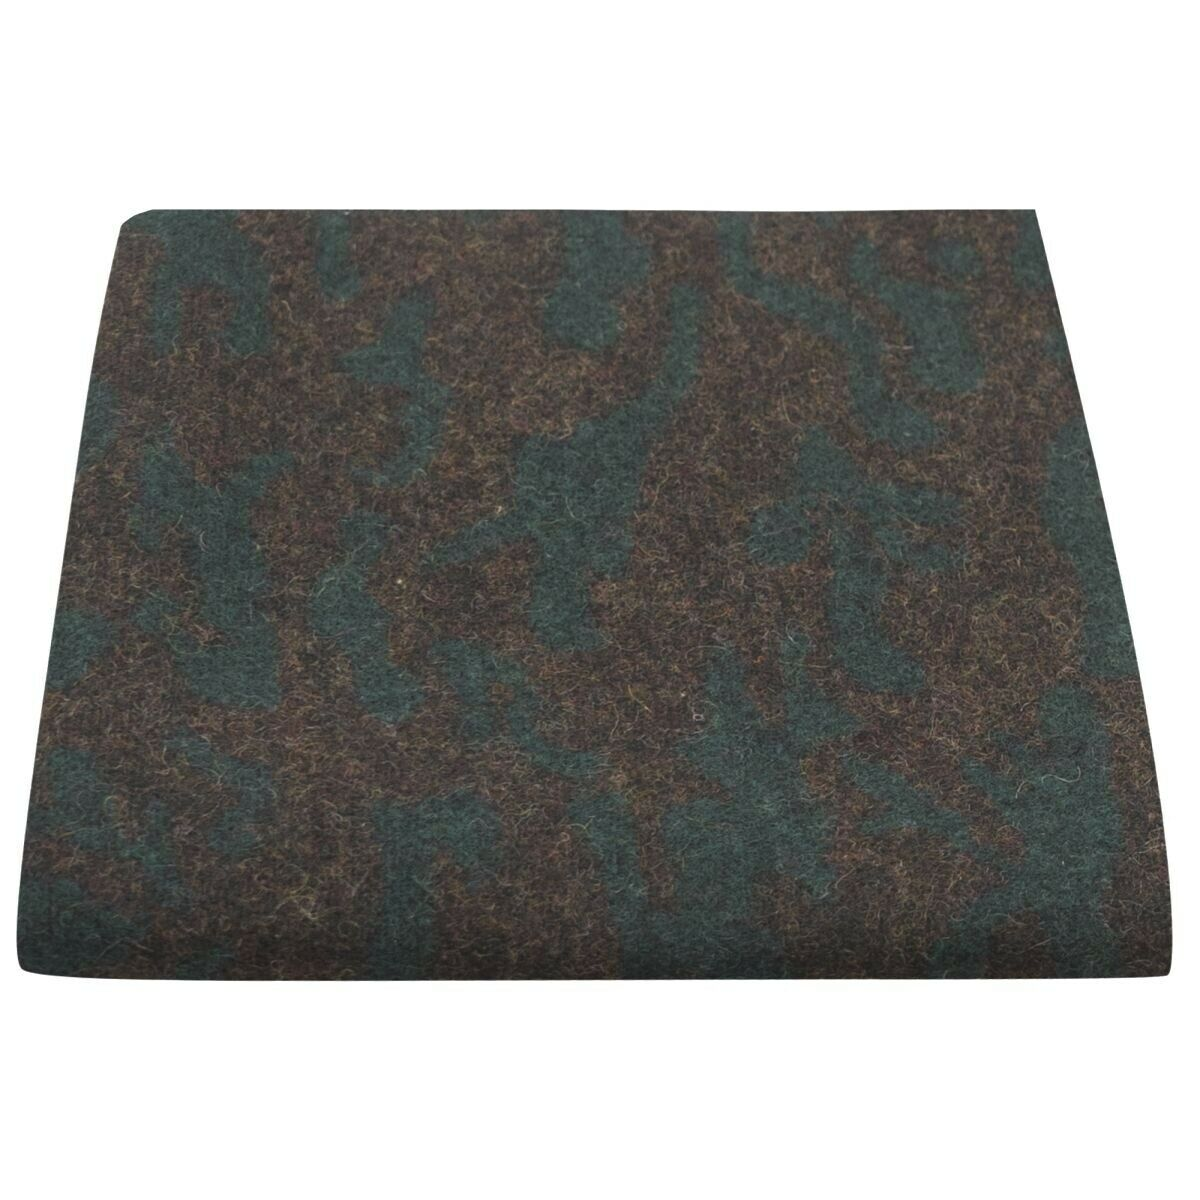 Luxury Persian Dark Blue Green Pattern Pocket Square, Handkerchief